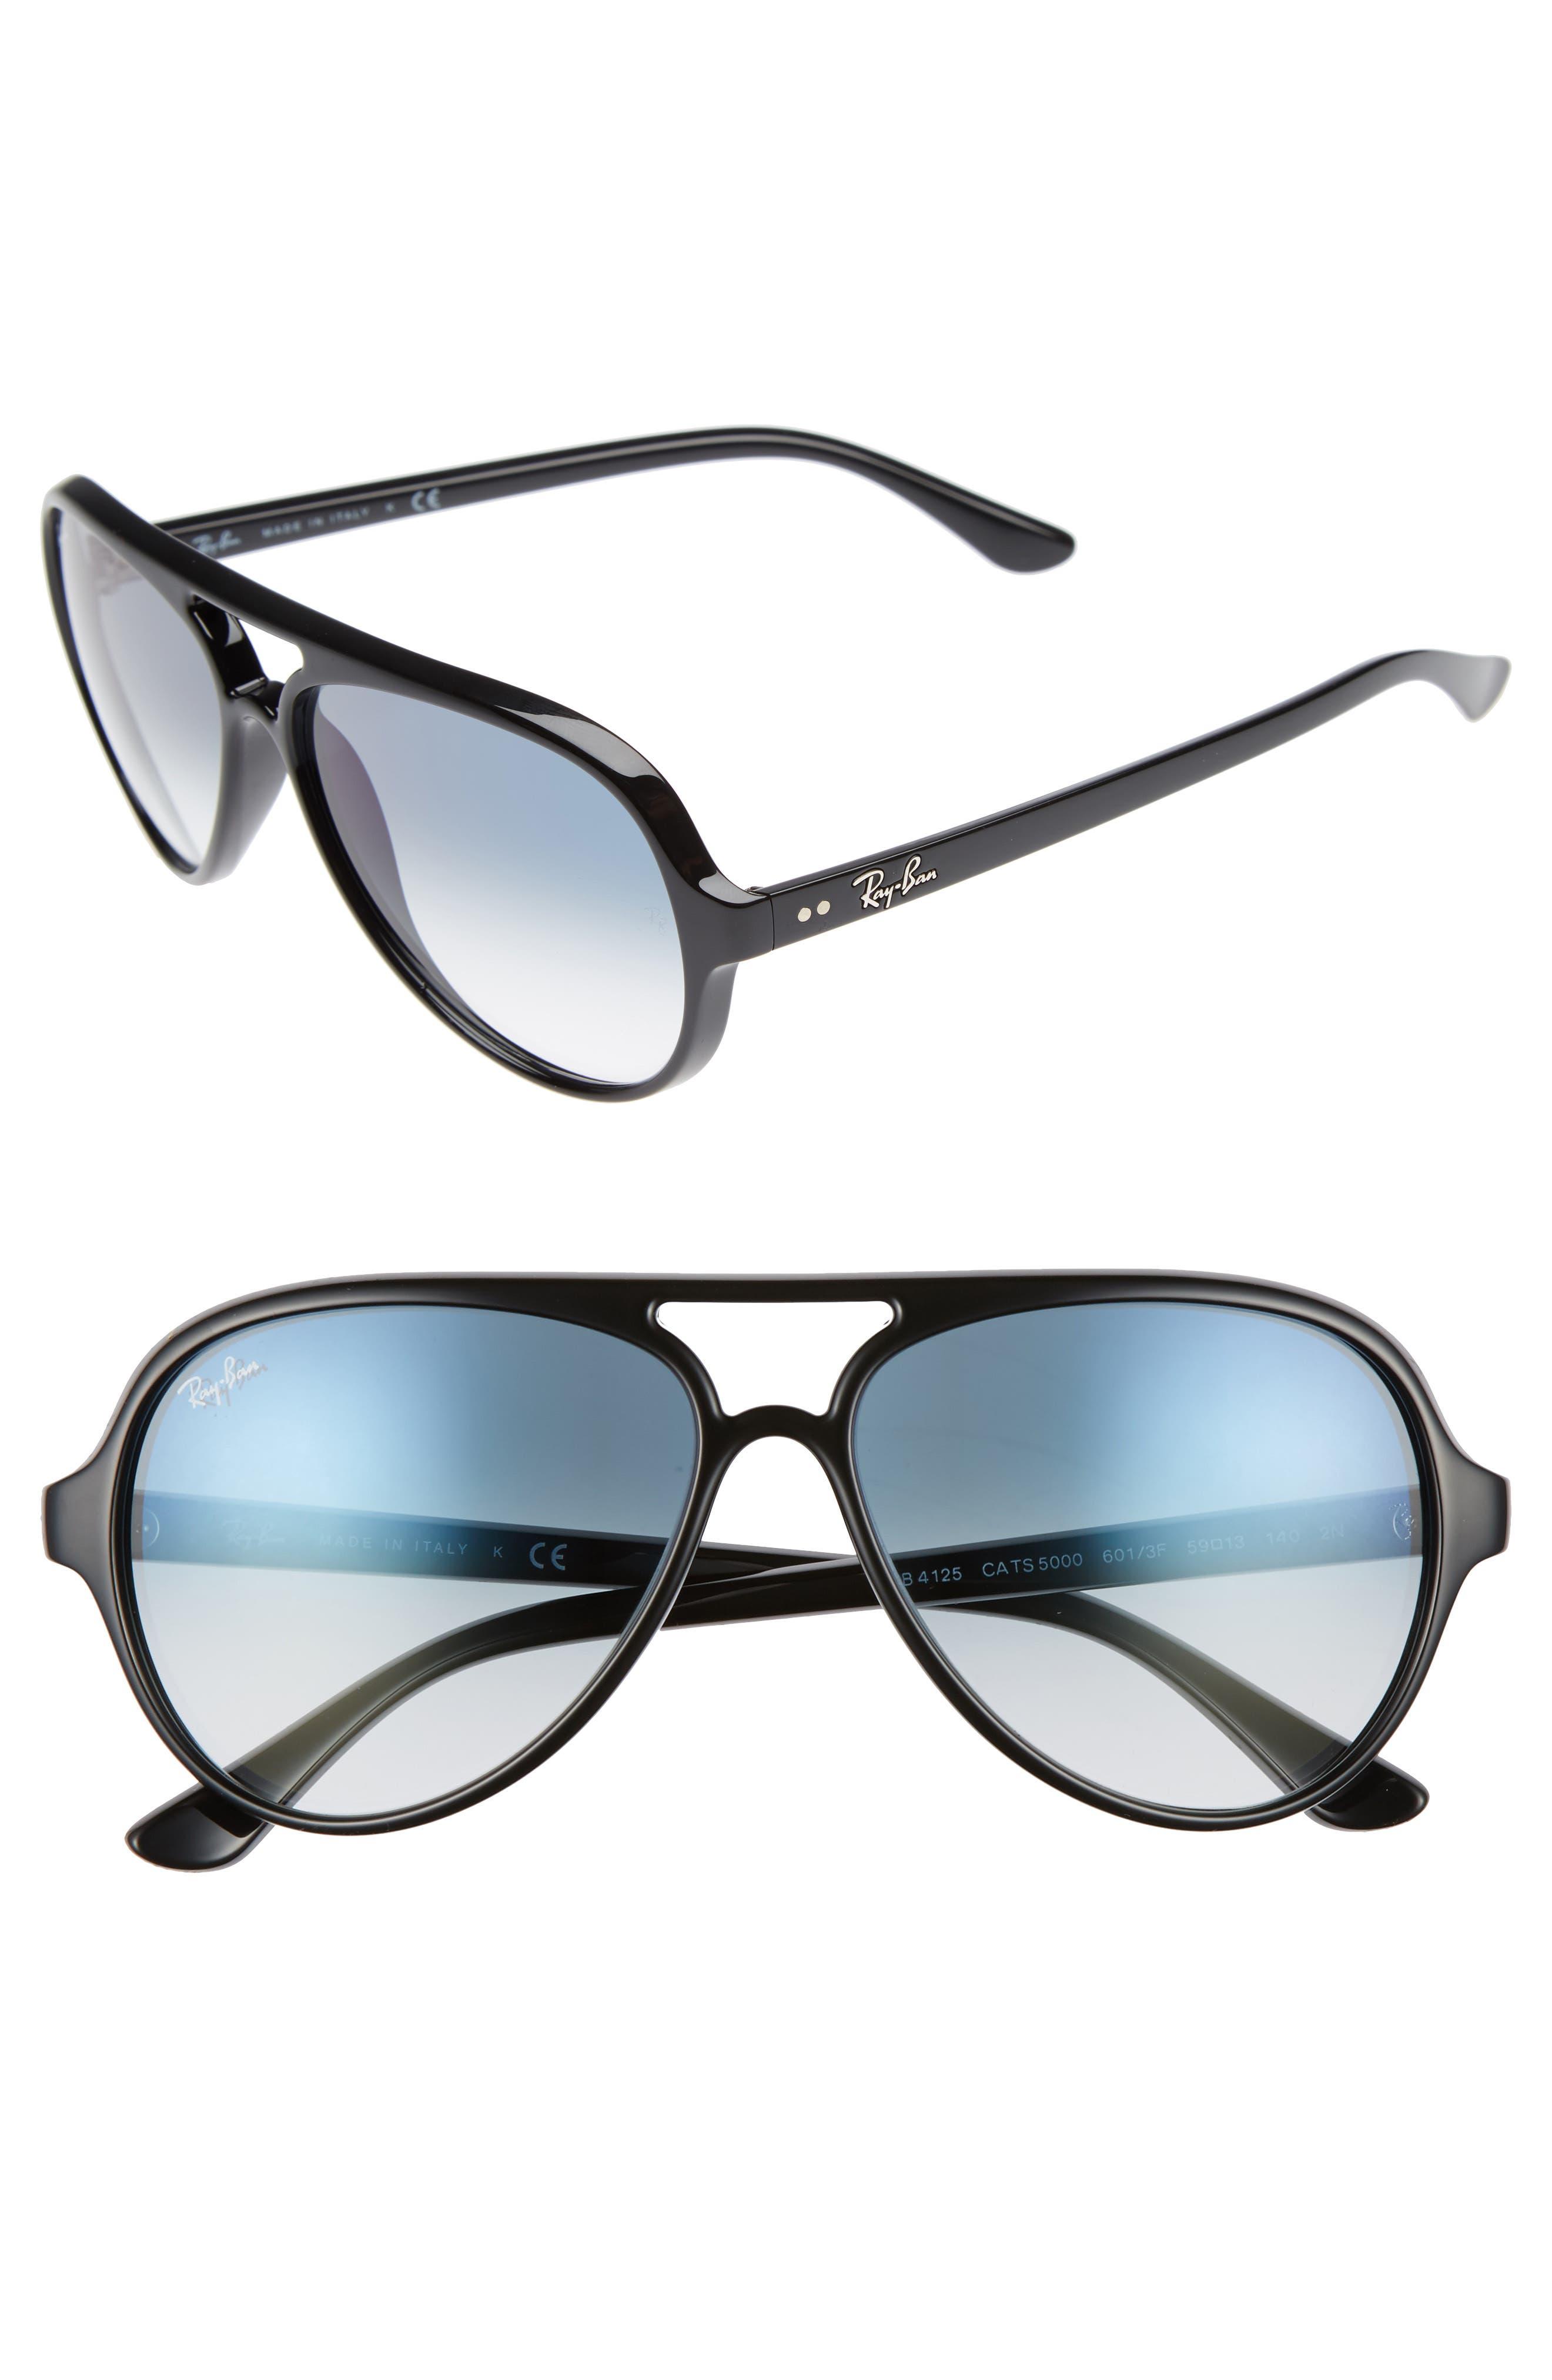 Alternate Image 1 Selected - Ray-Ban 59mm Resin Aviator Sunglasses